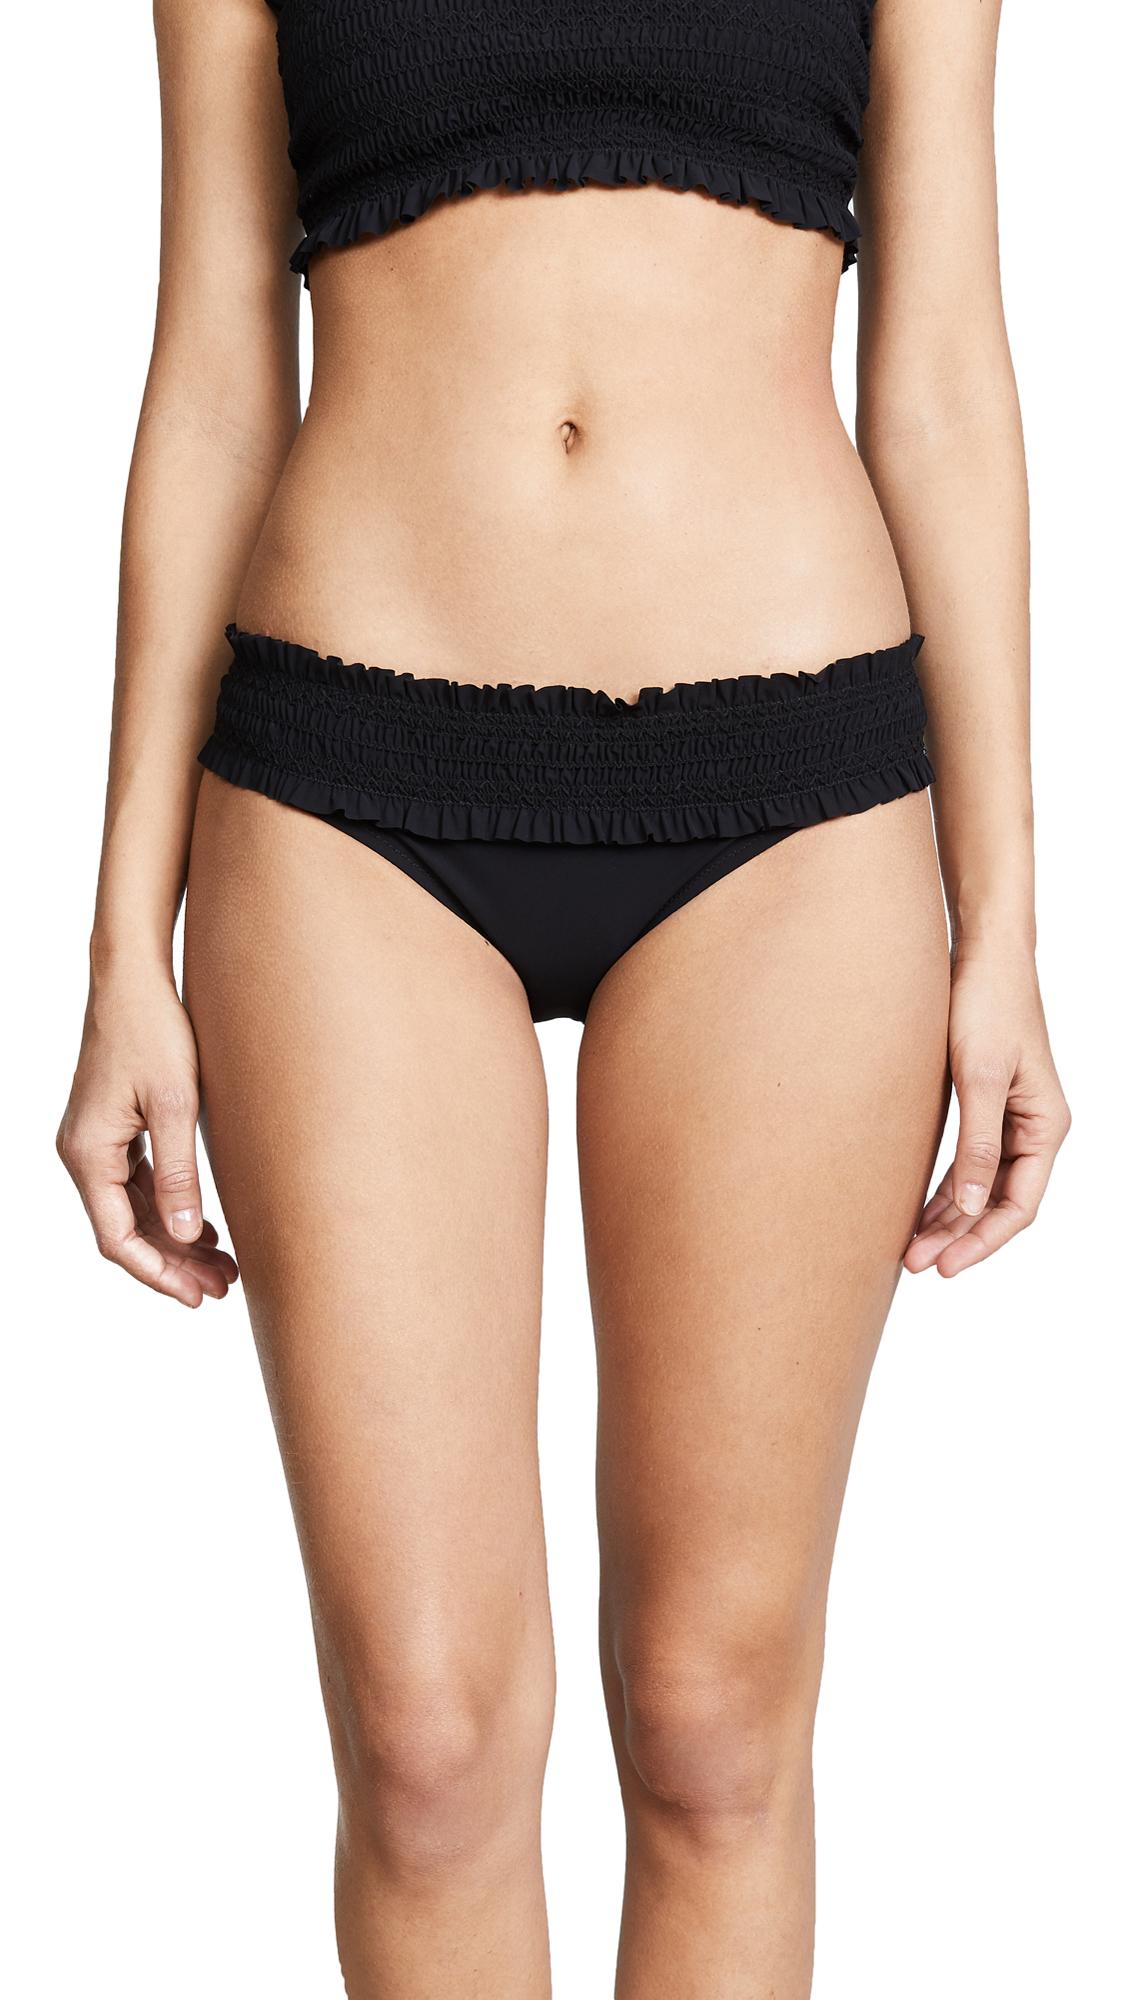 Tory Burch Costa Hipster Bikini Bottoms - Black